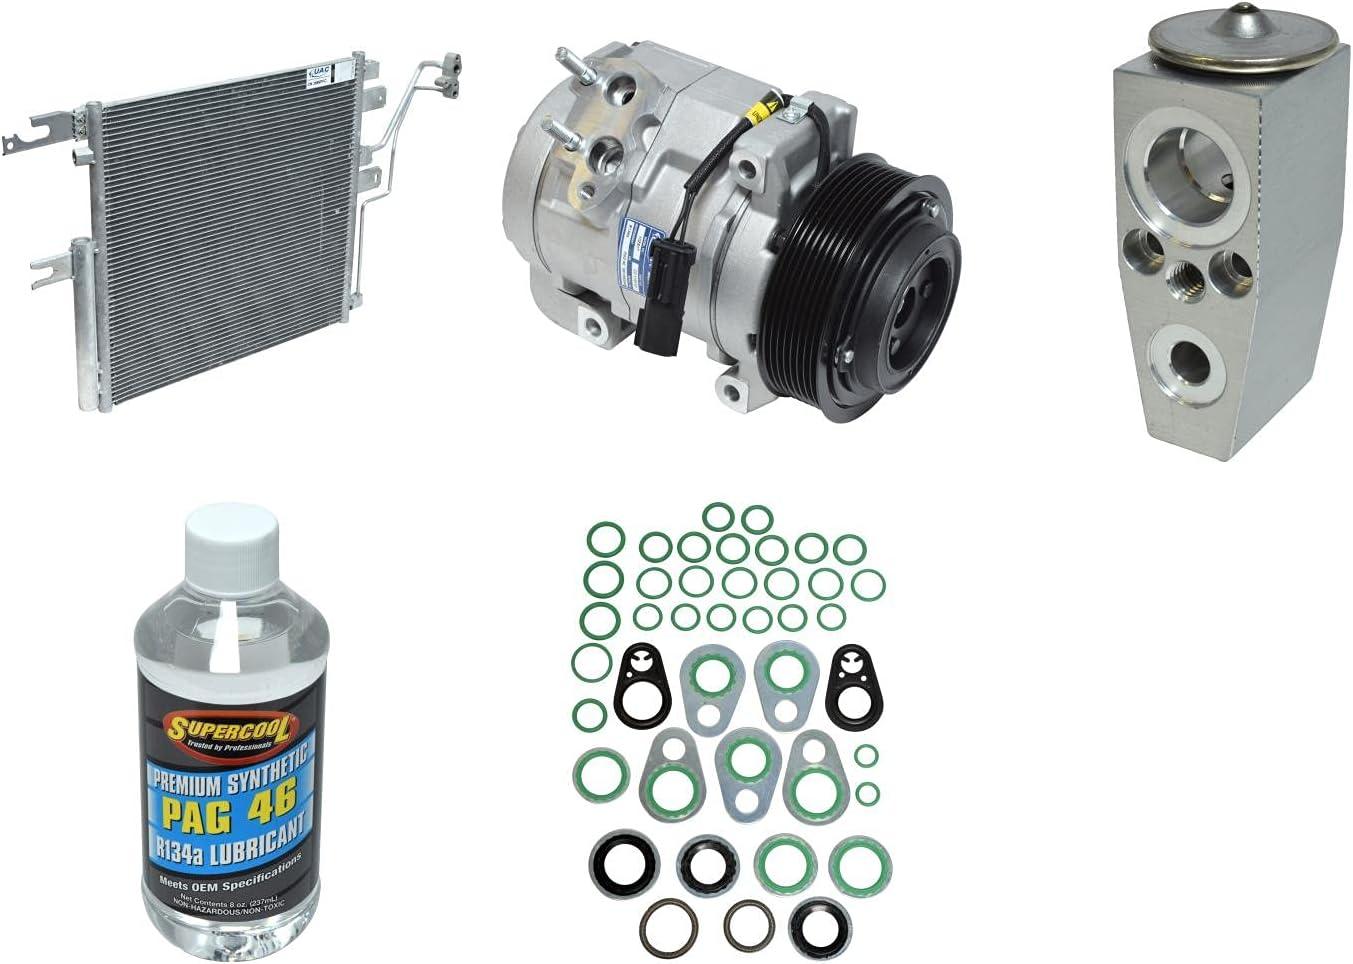 A C Compressor Minneapolis Mall Max 44% OFF and KT 5434B Component Kit